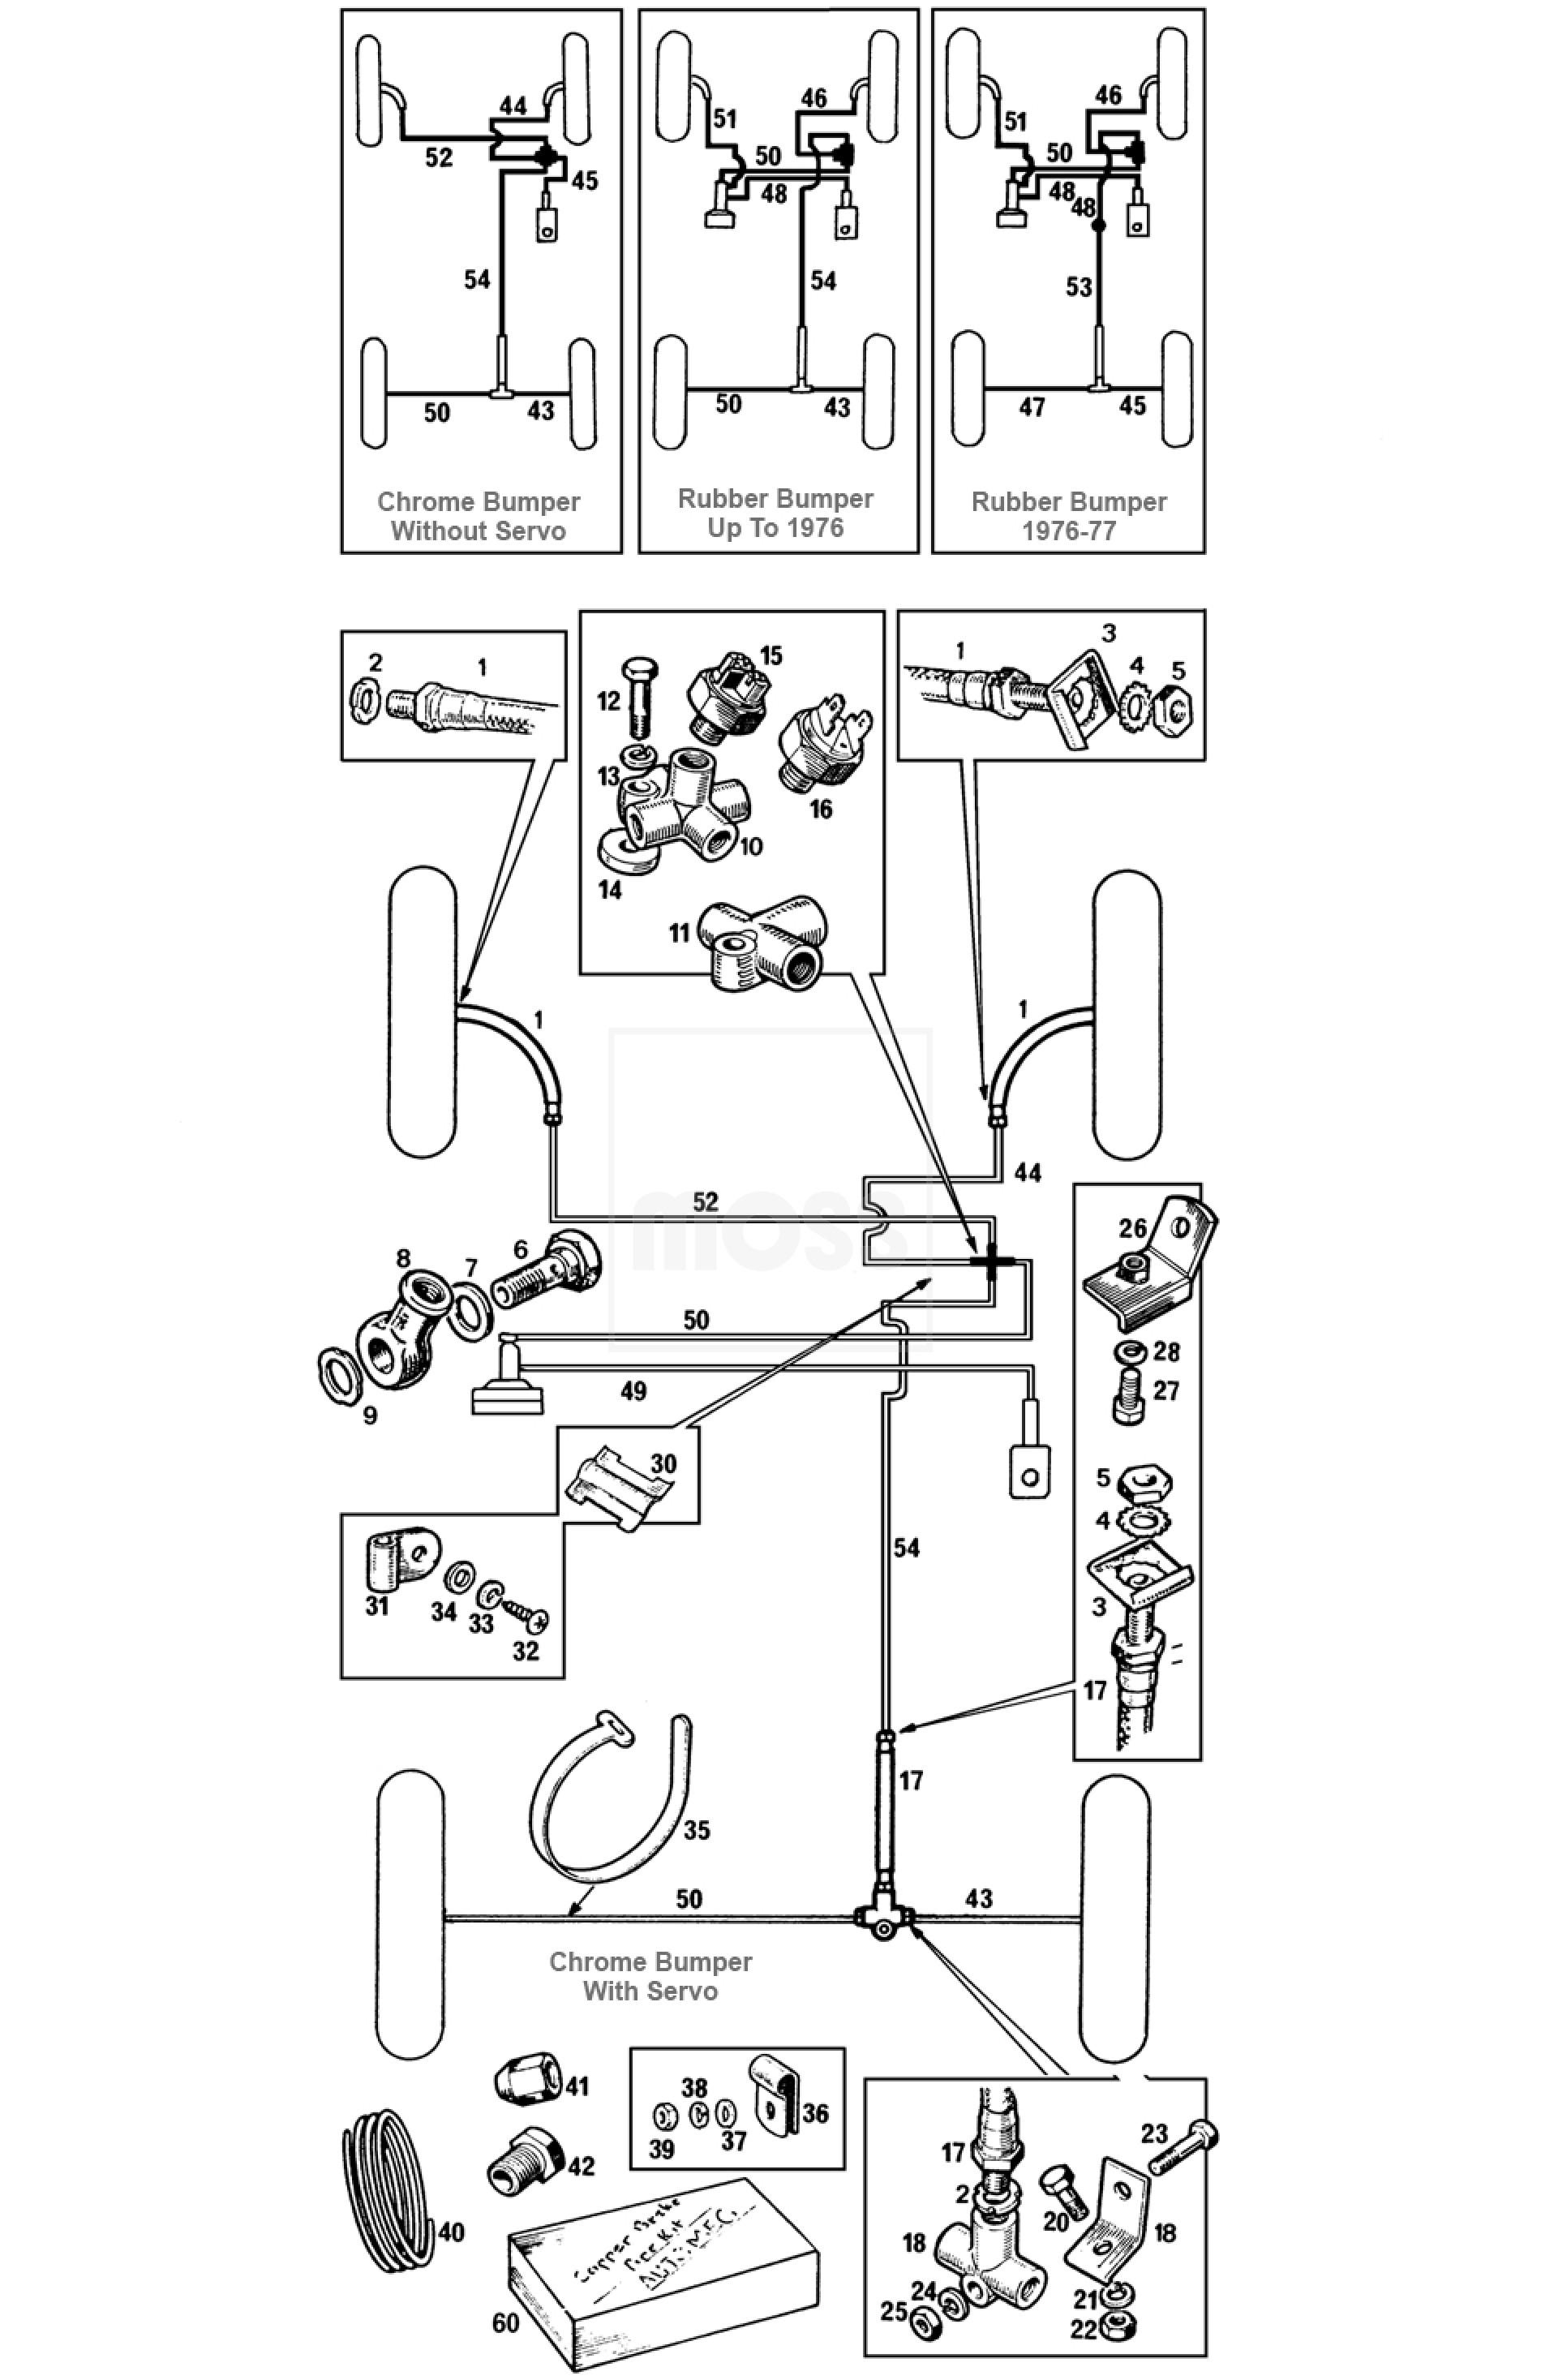 Brake Pipes Amp Hoses Single Line System